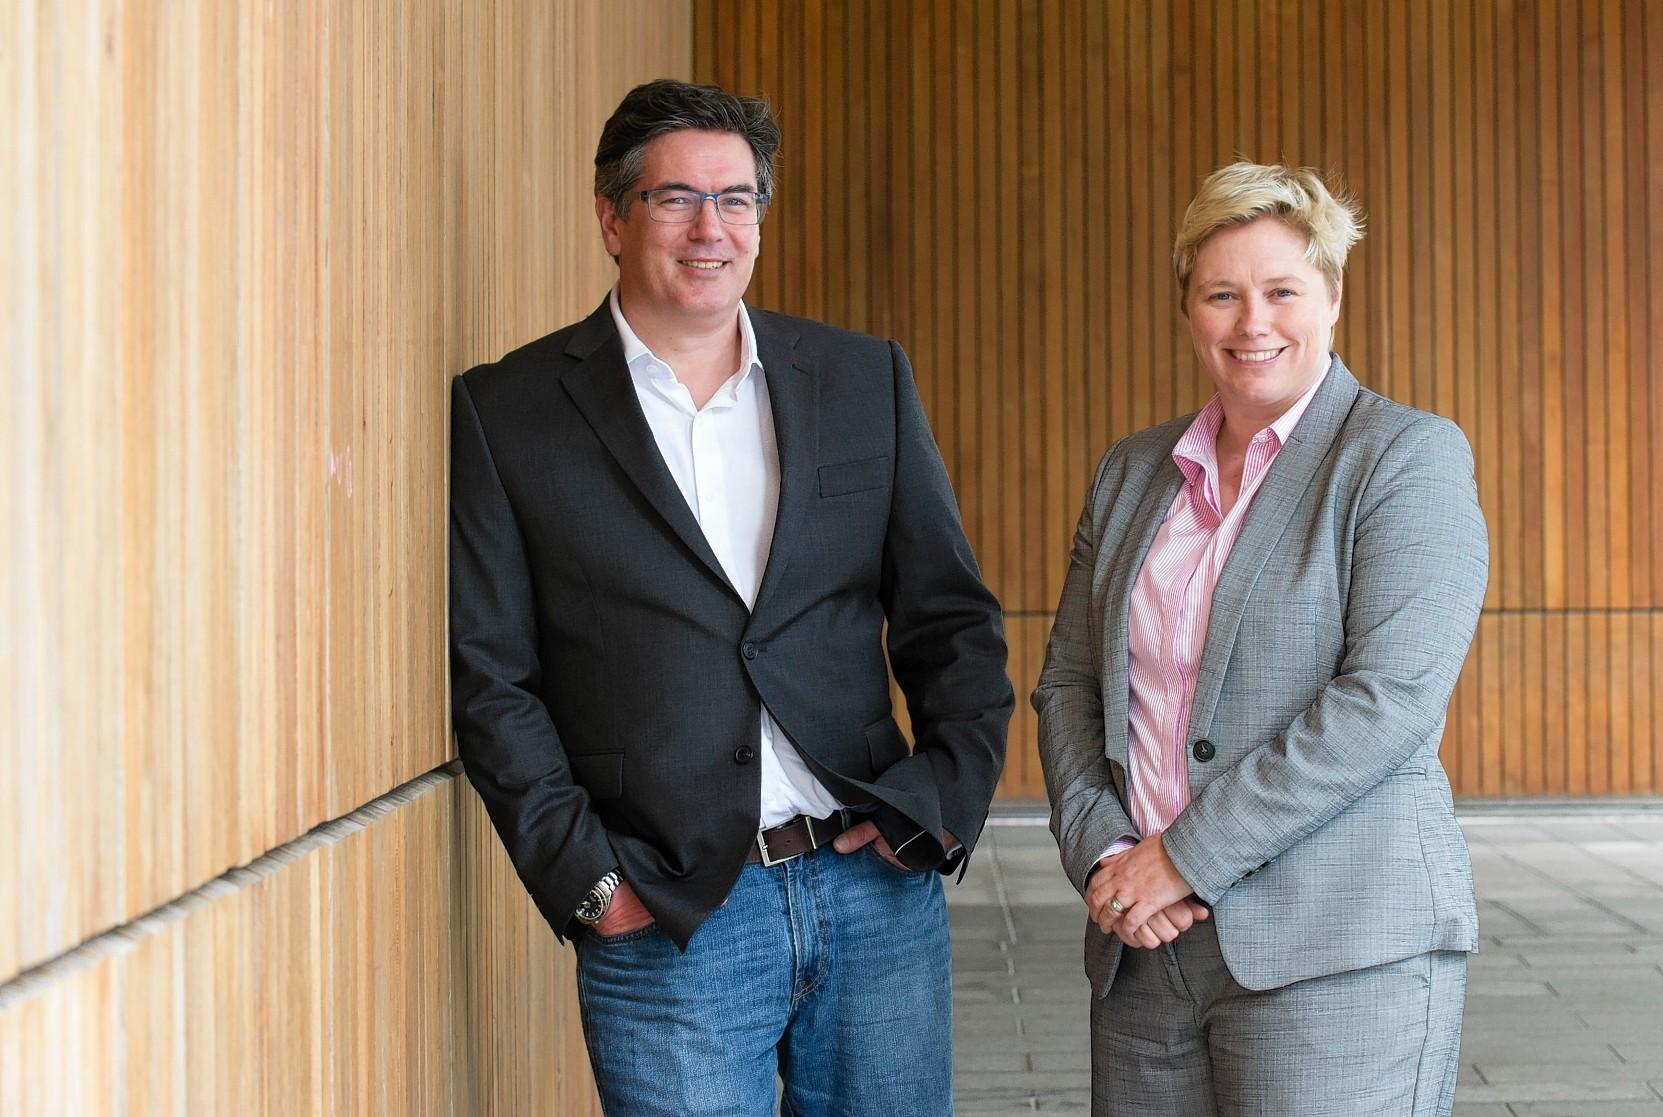 Duncan Hart, business development and Gillian Docherty, ceo of Data Lab